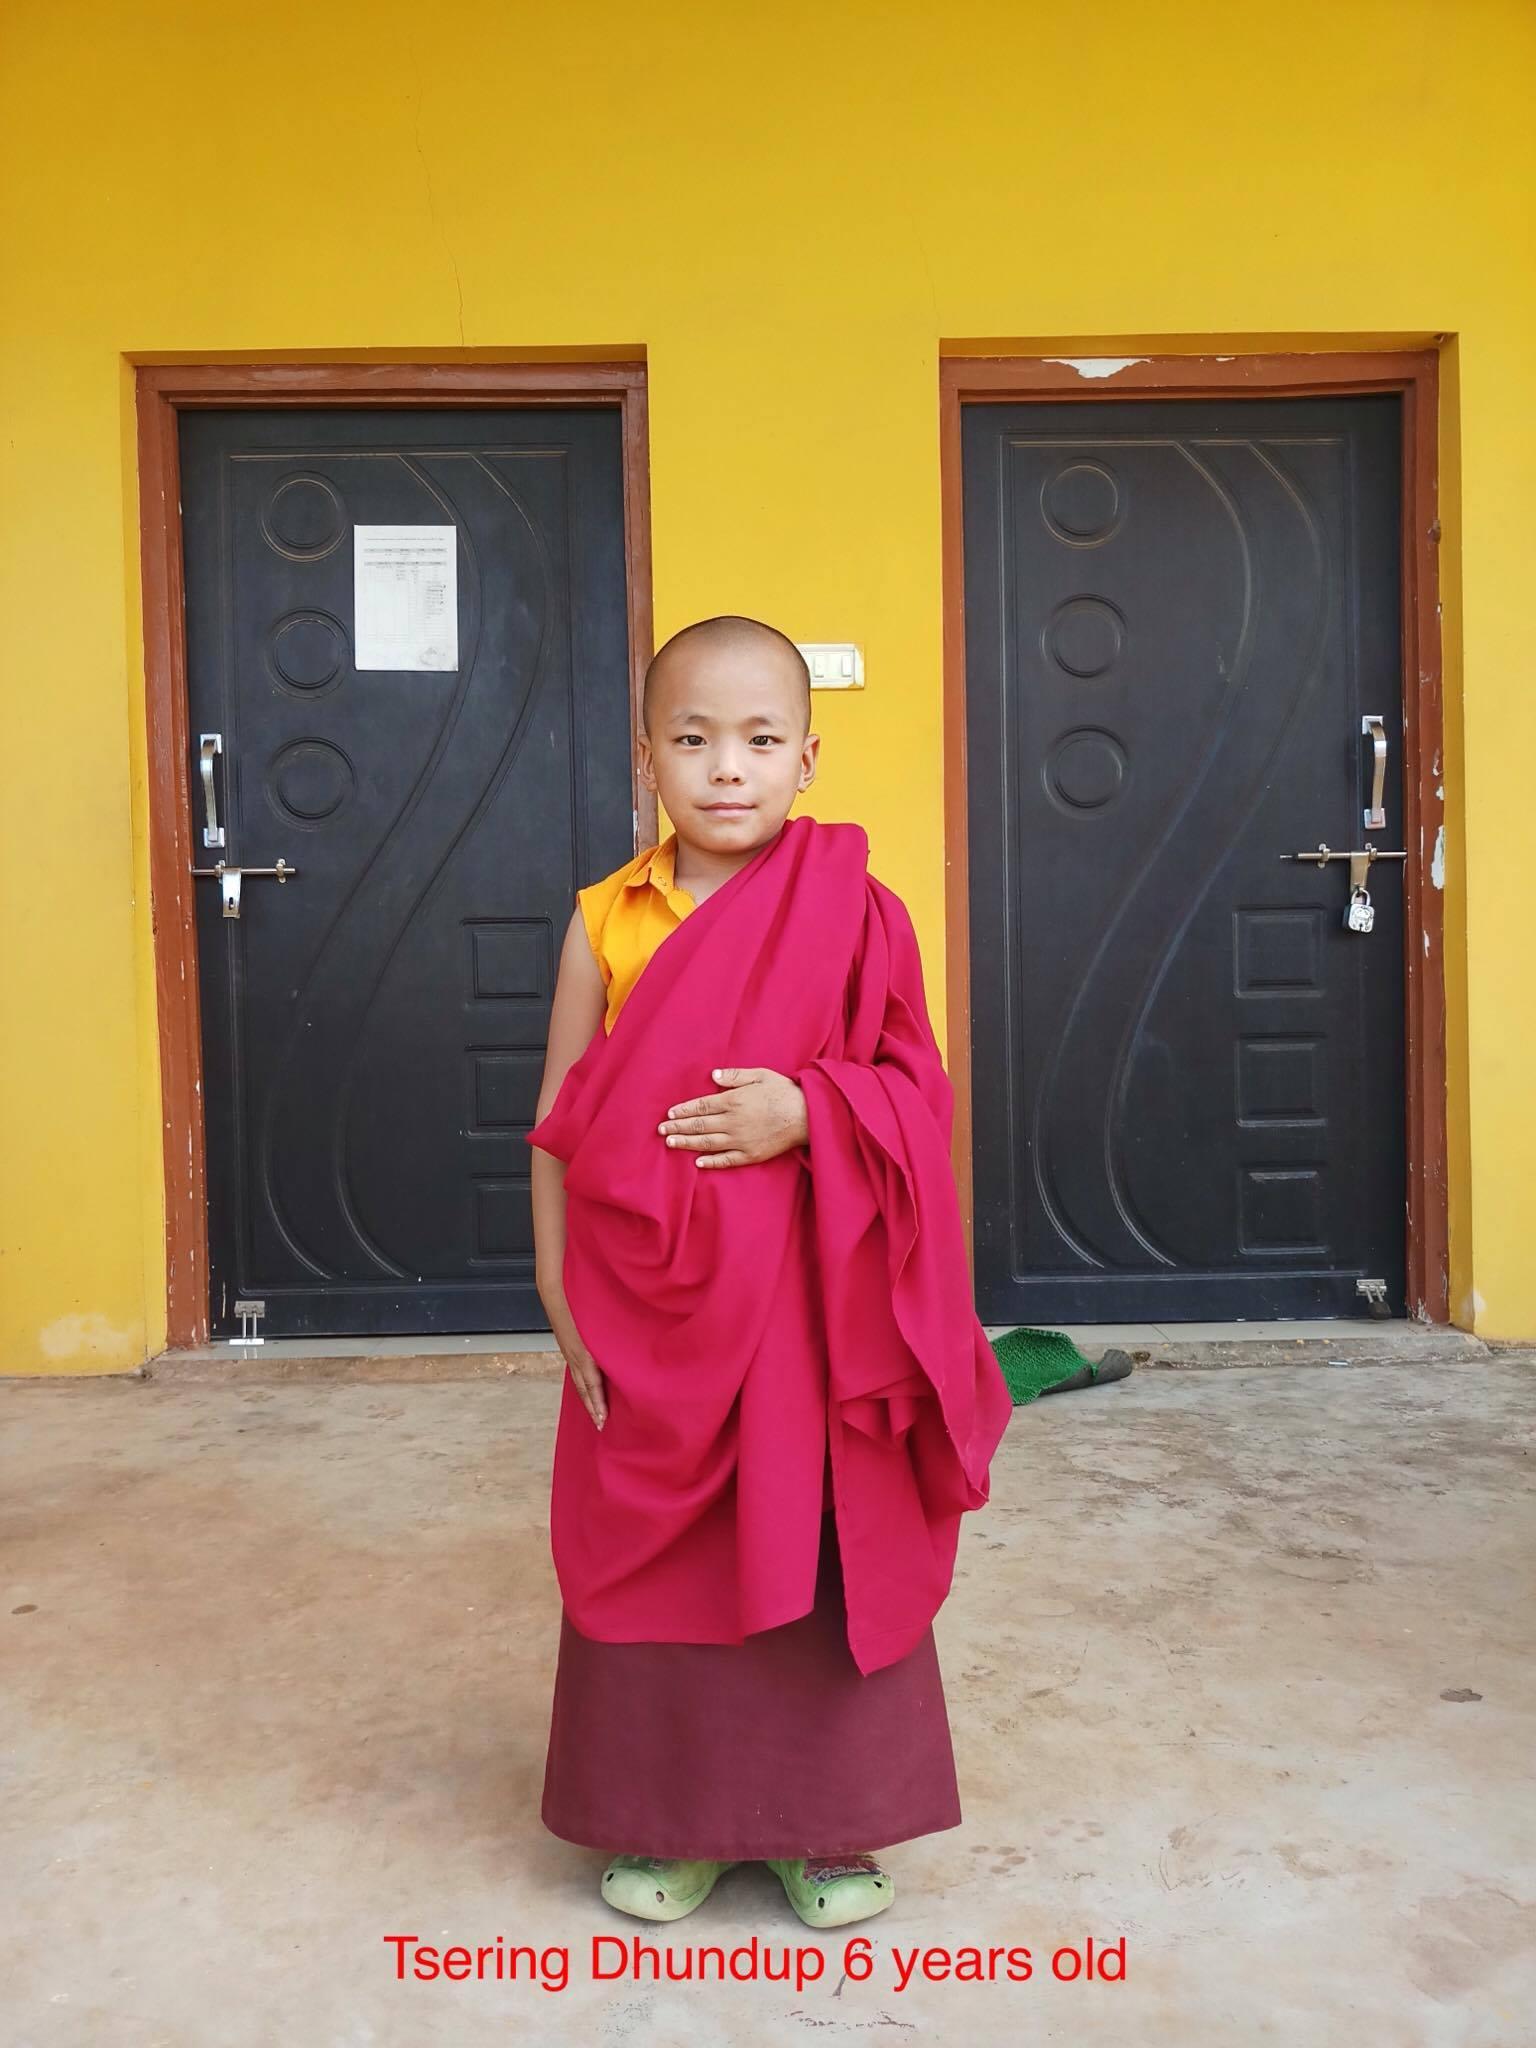 Monk_Tsering_Dhundup_6yrs_old.jpg